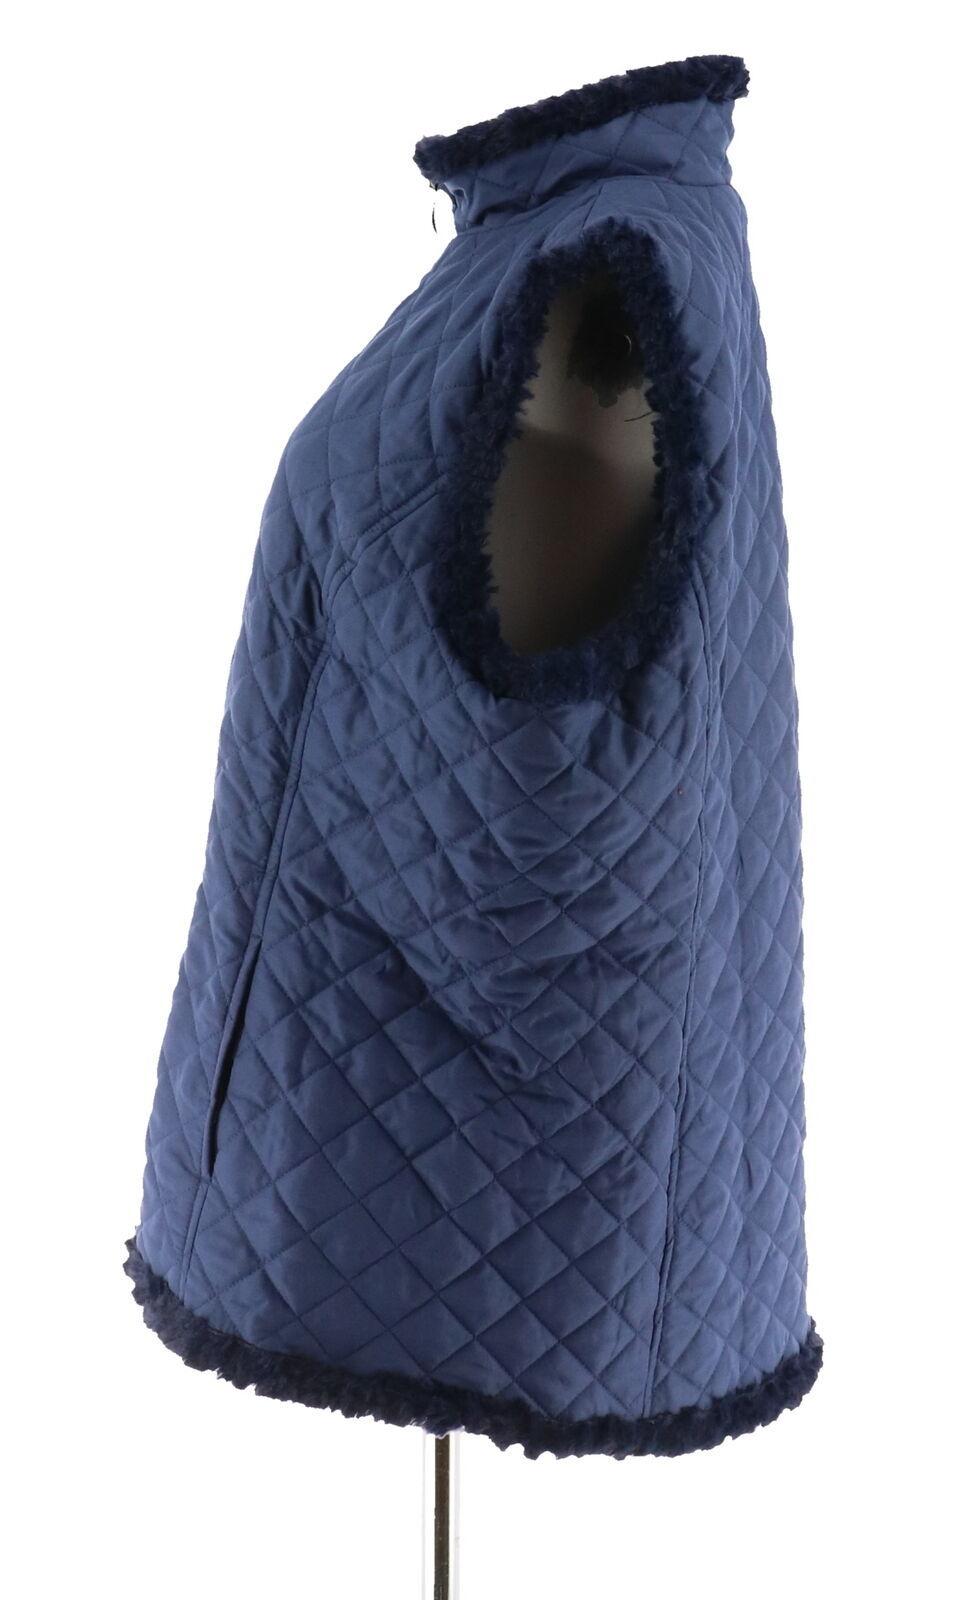 Denim & Co Reversible Zip Front Textured Quilted Vest Dark Indigo M NEW A282681 image 2